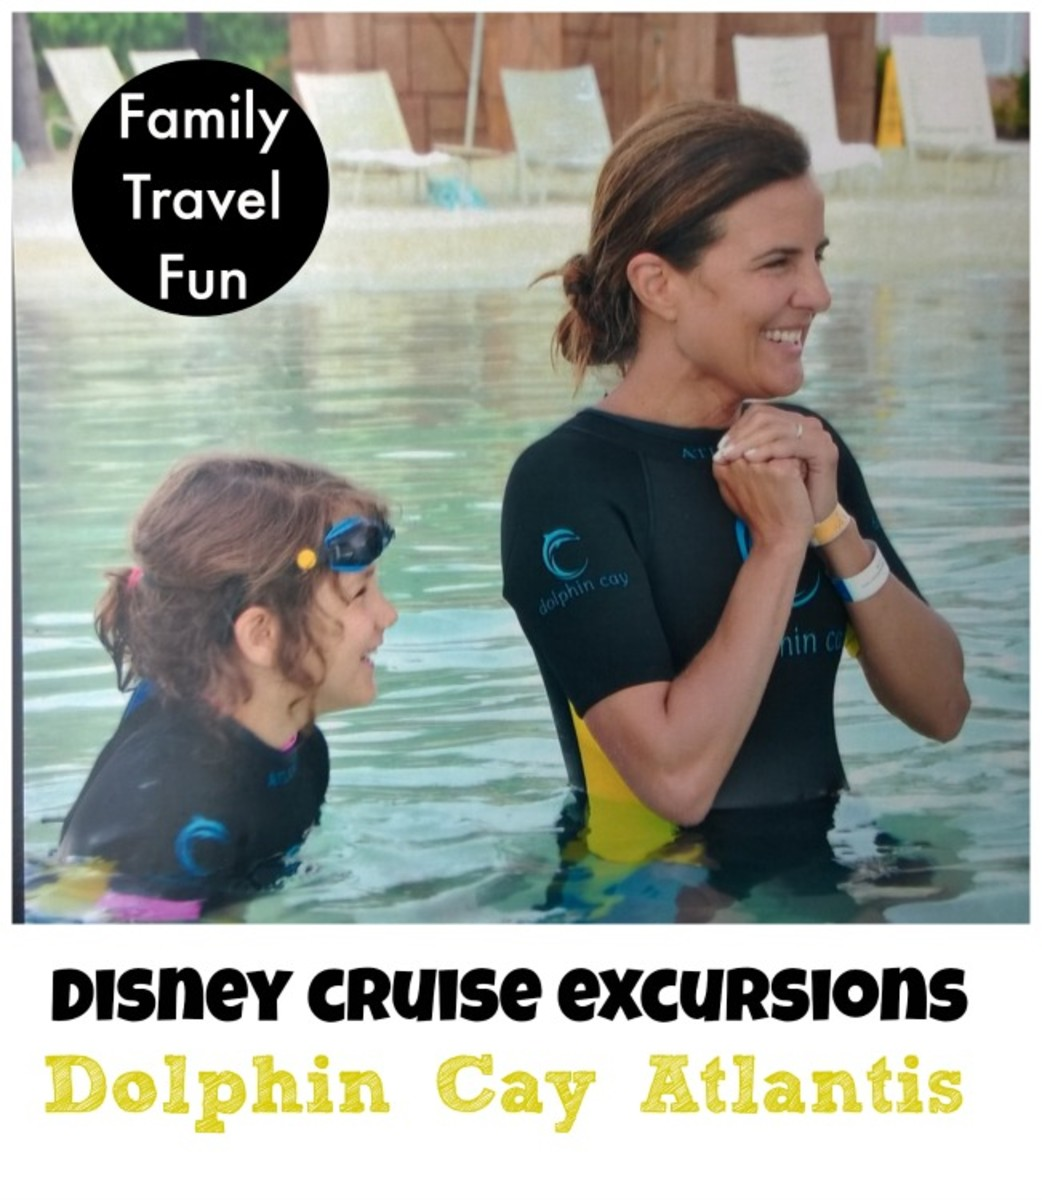 Disney Dream Excursions